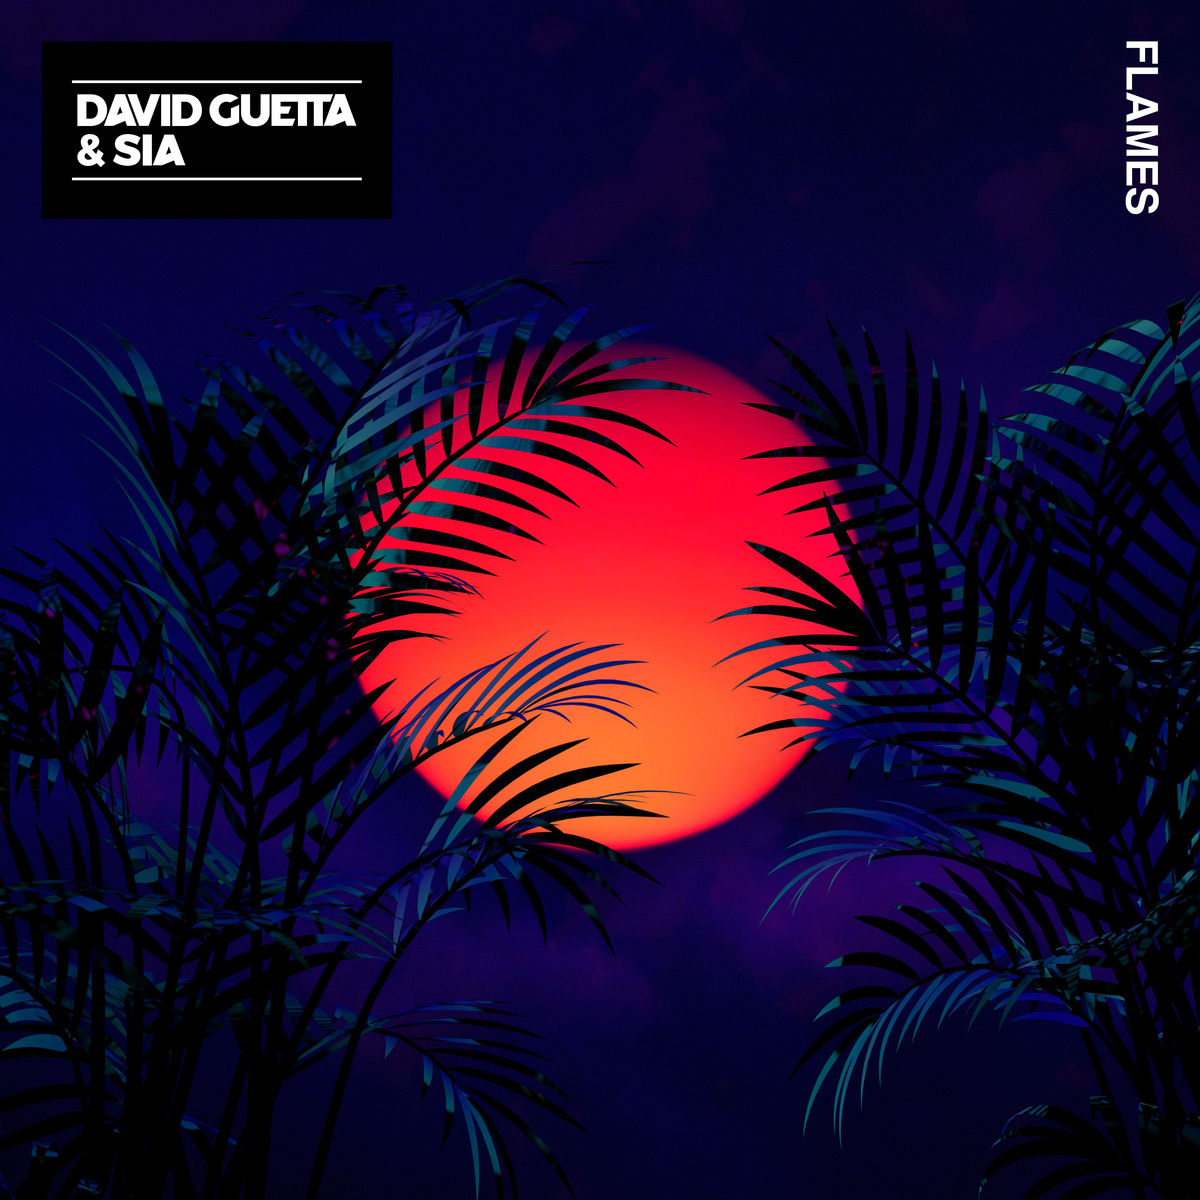 ultratop be - David Guetta & Sia - Flames